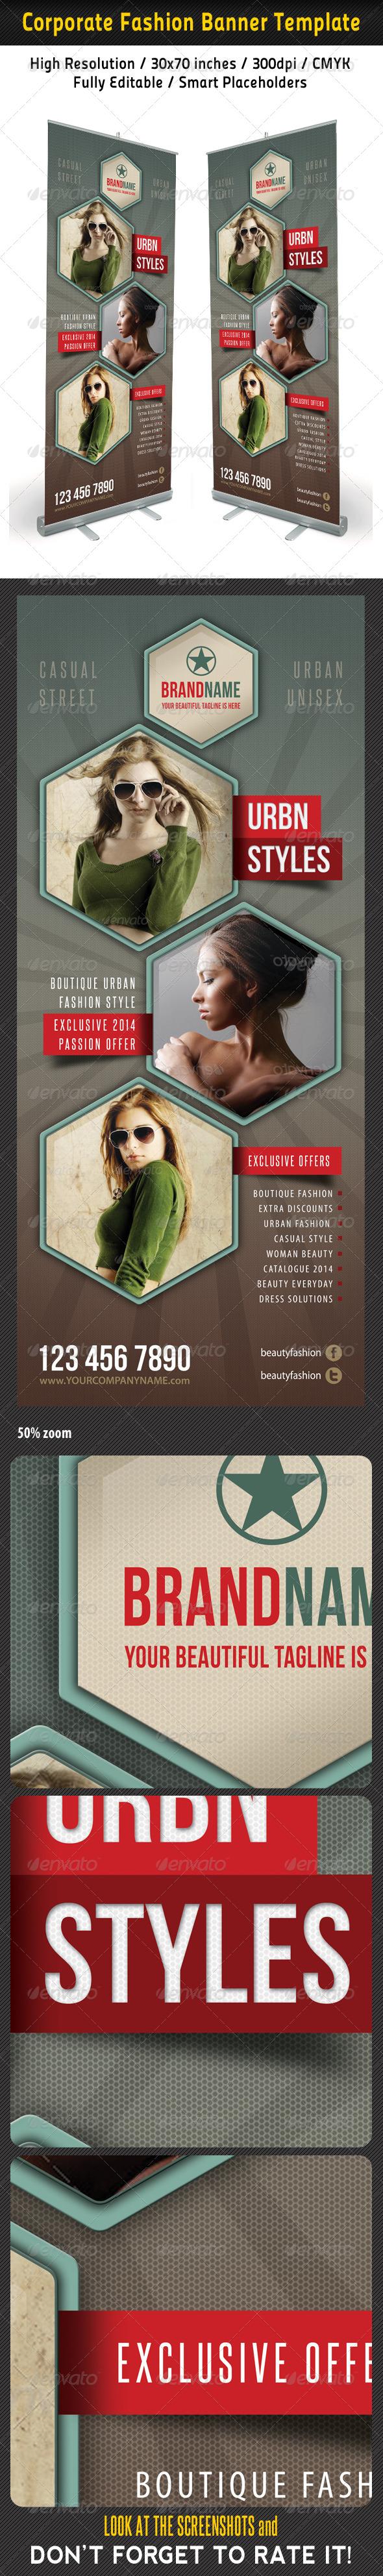 Fashion Multipurpose Banner Template 31 - Signage Print Templates